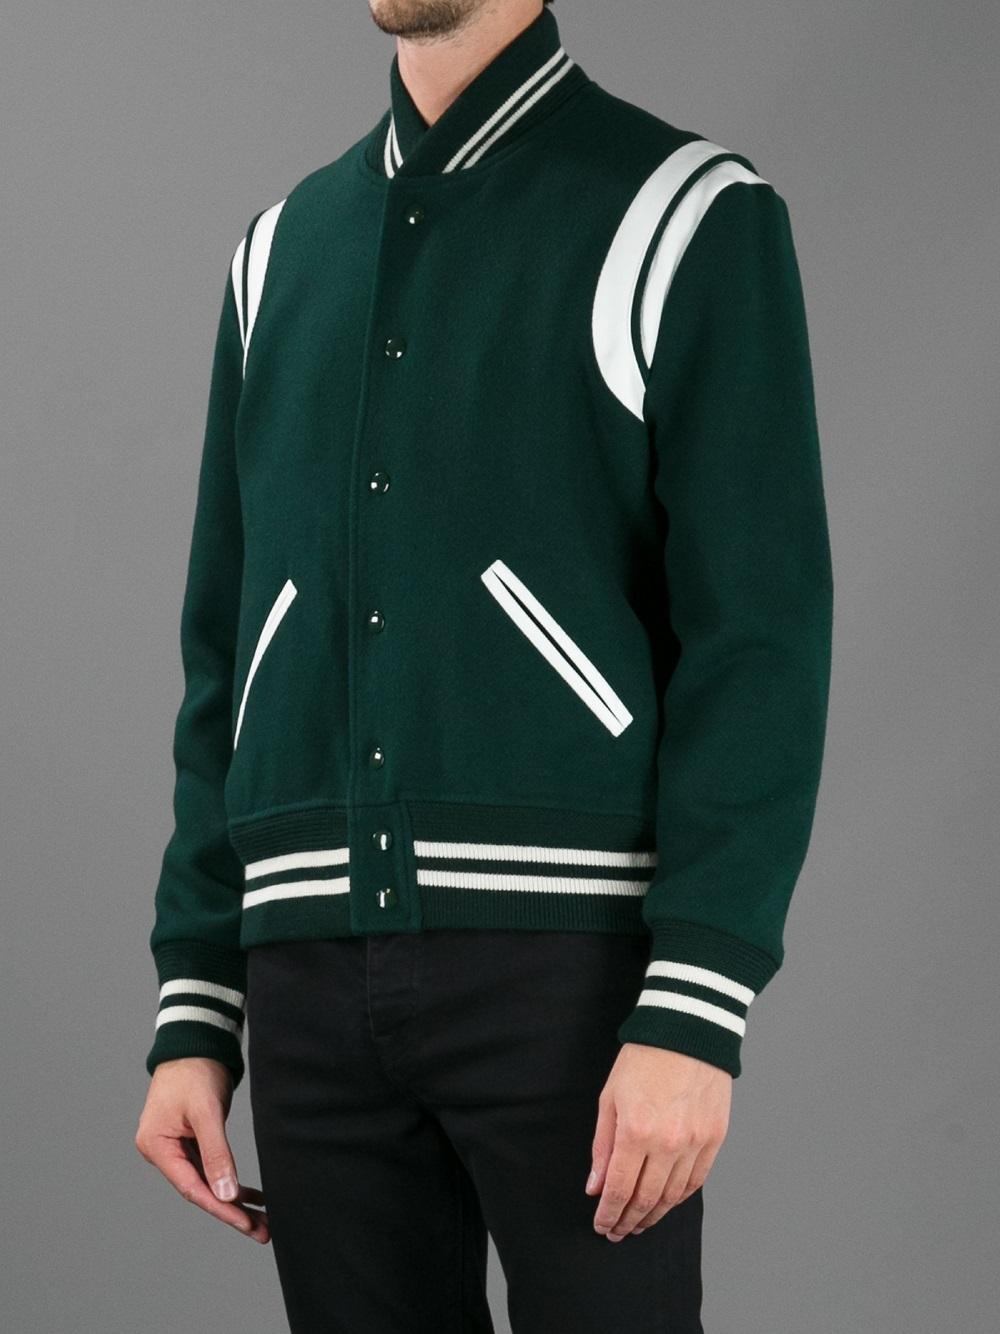 Find great deals on eBay for saint laurent varsity jacket. Shop with confidence.